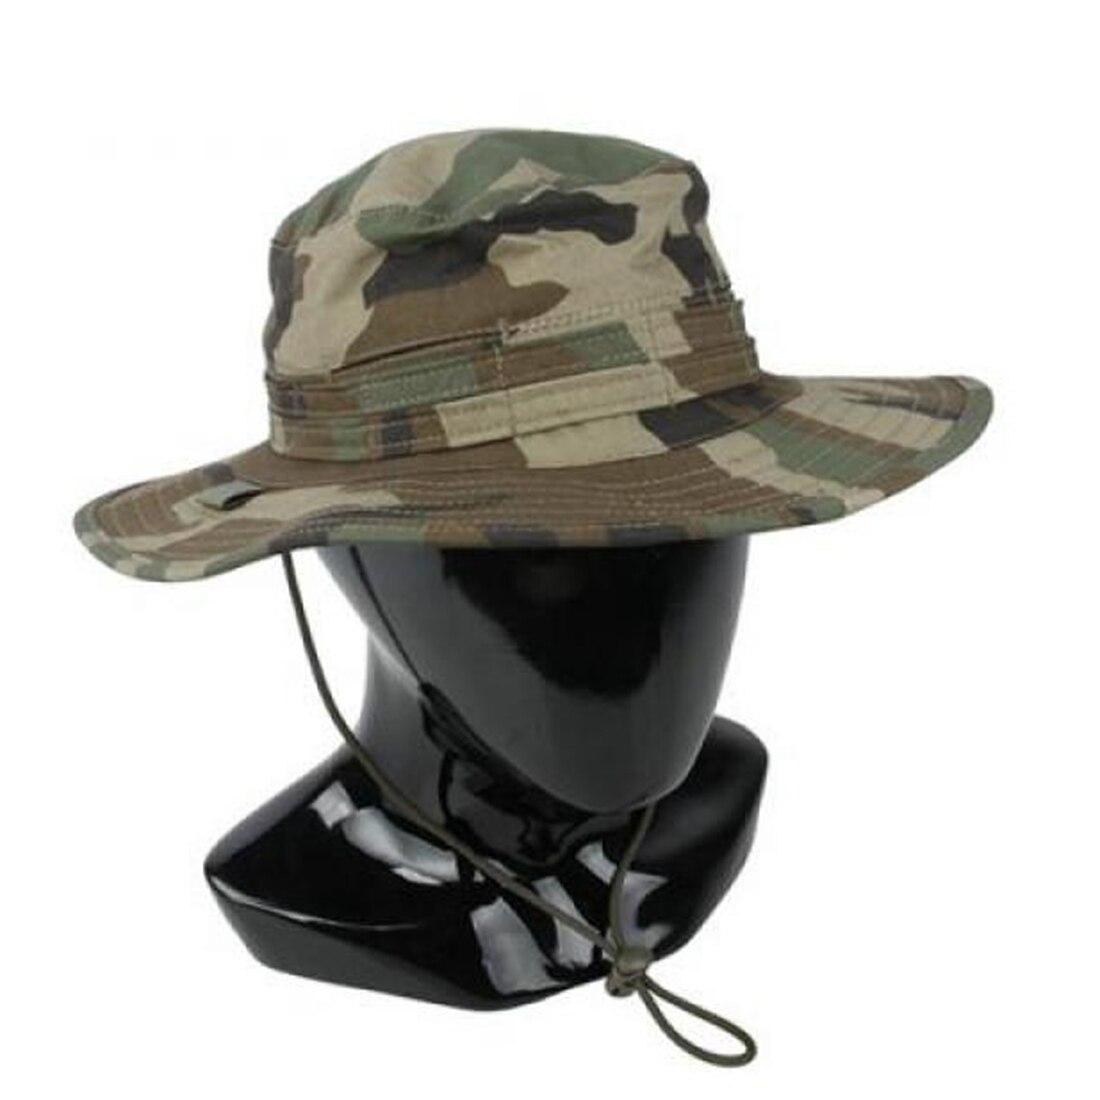 TMC2629 التكتيكية نايلون Boonie قبعة للرجال النساء في الهواء الطلق تكتيكات اكسسوارات-WL MCBK (م)